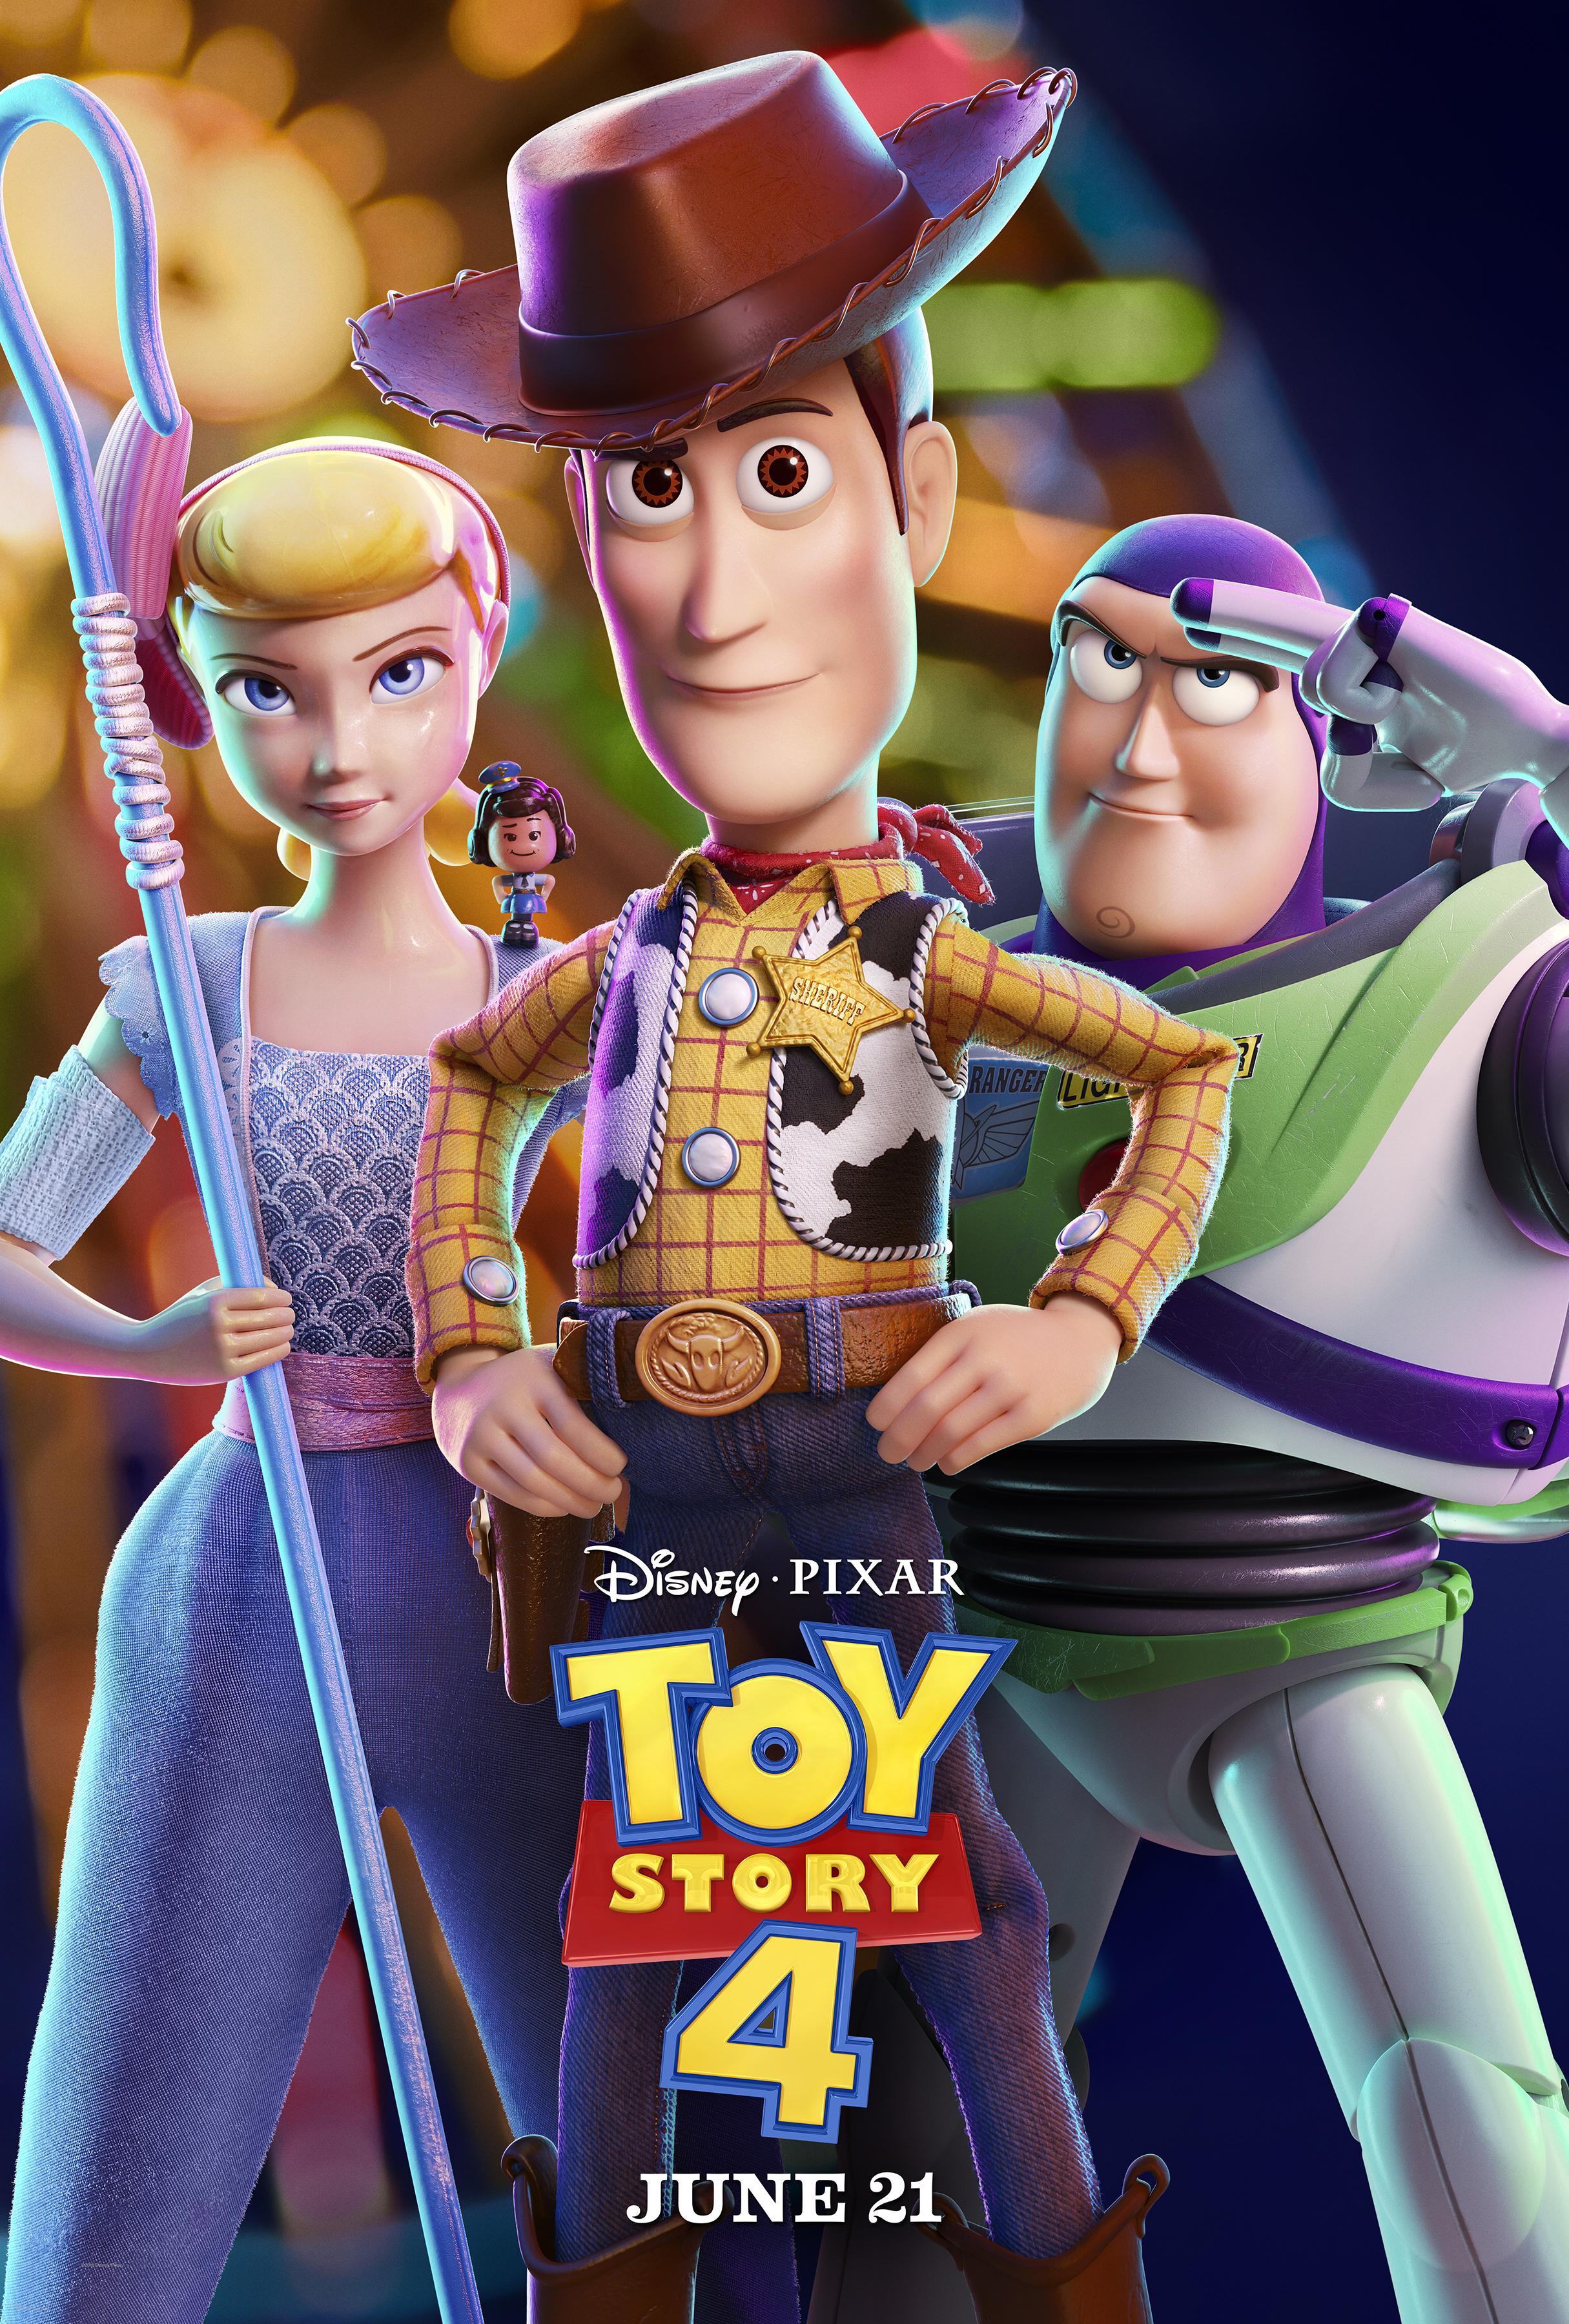 Movie Madness - Toy Story 4